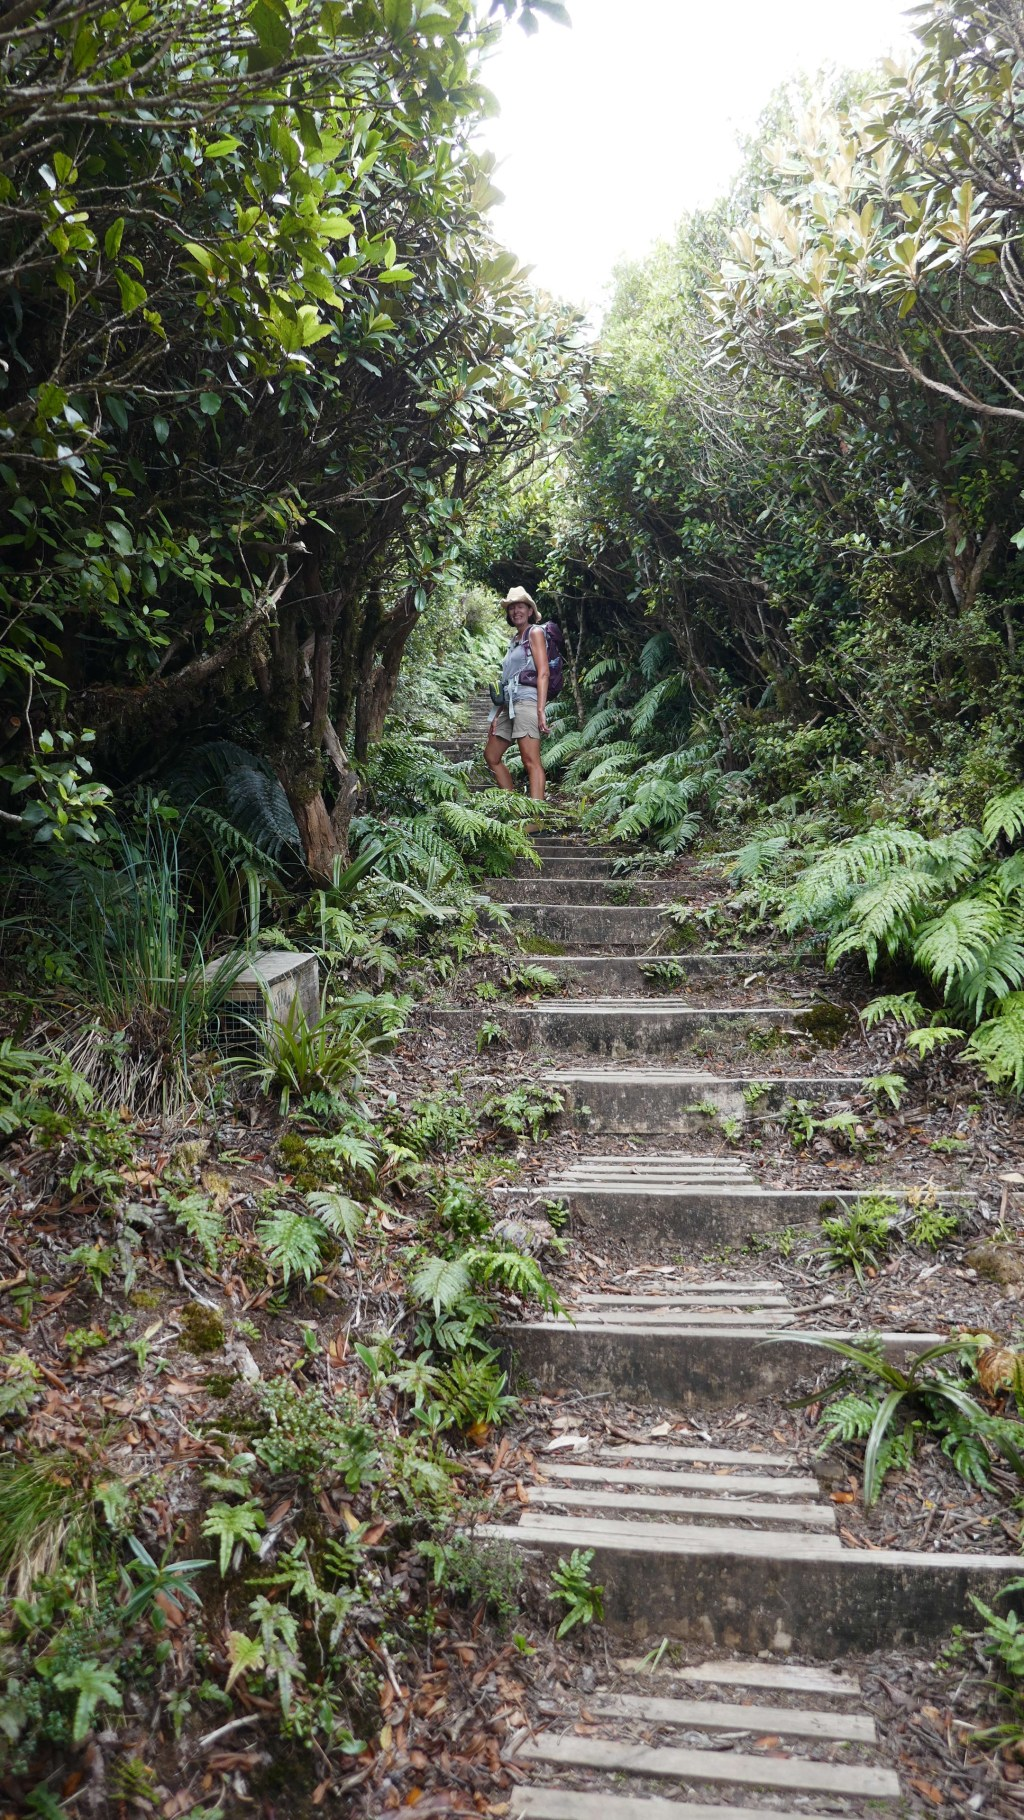 Mt. Taranaki Mangorei Track Top 12 Walks In The North Island